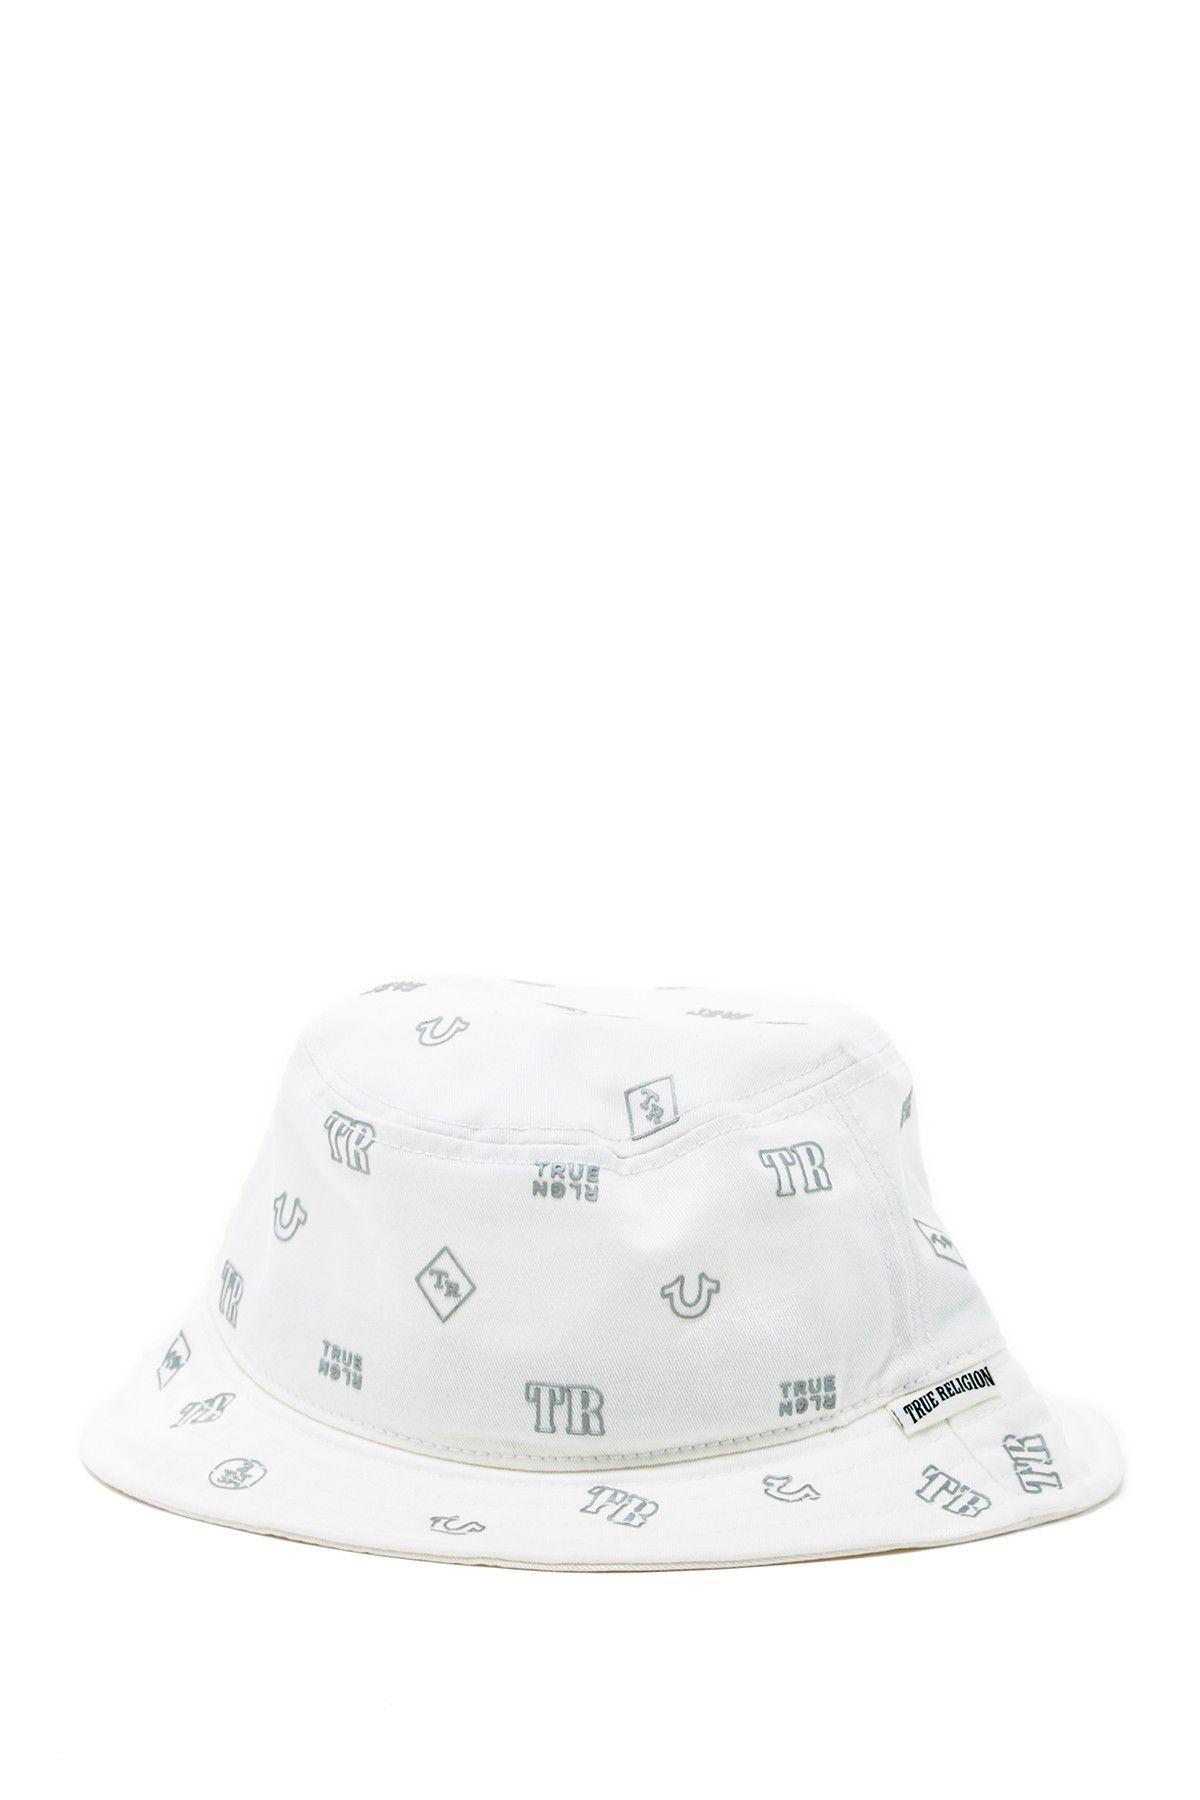 5cee23ed Bucket Hat, True Religion, Monogram, Nordstrom Rack, Hats, Monogram Tote,